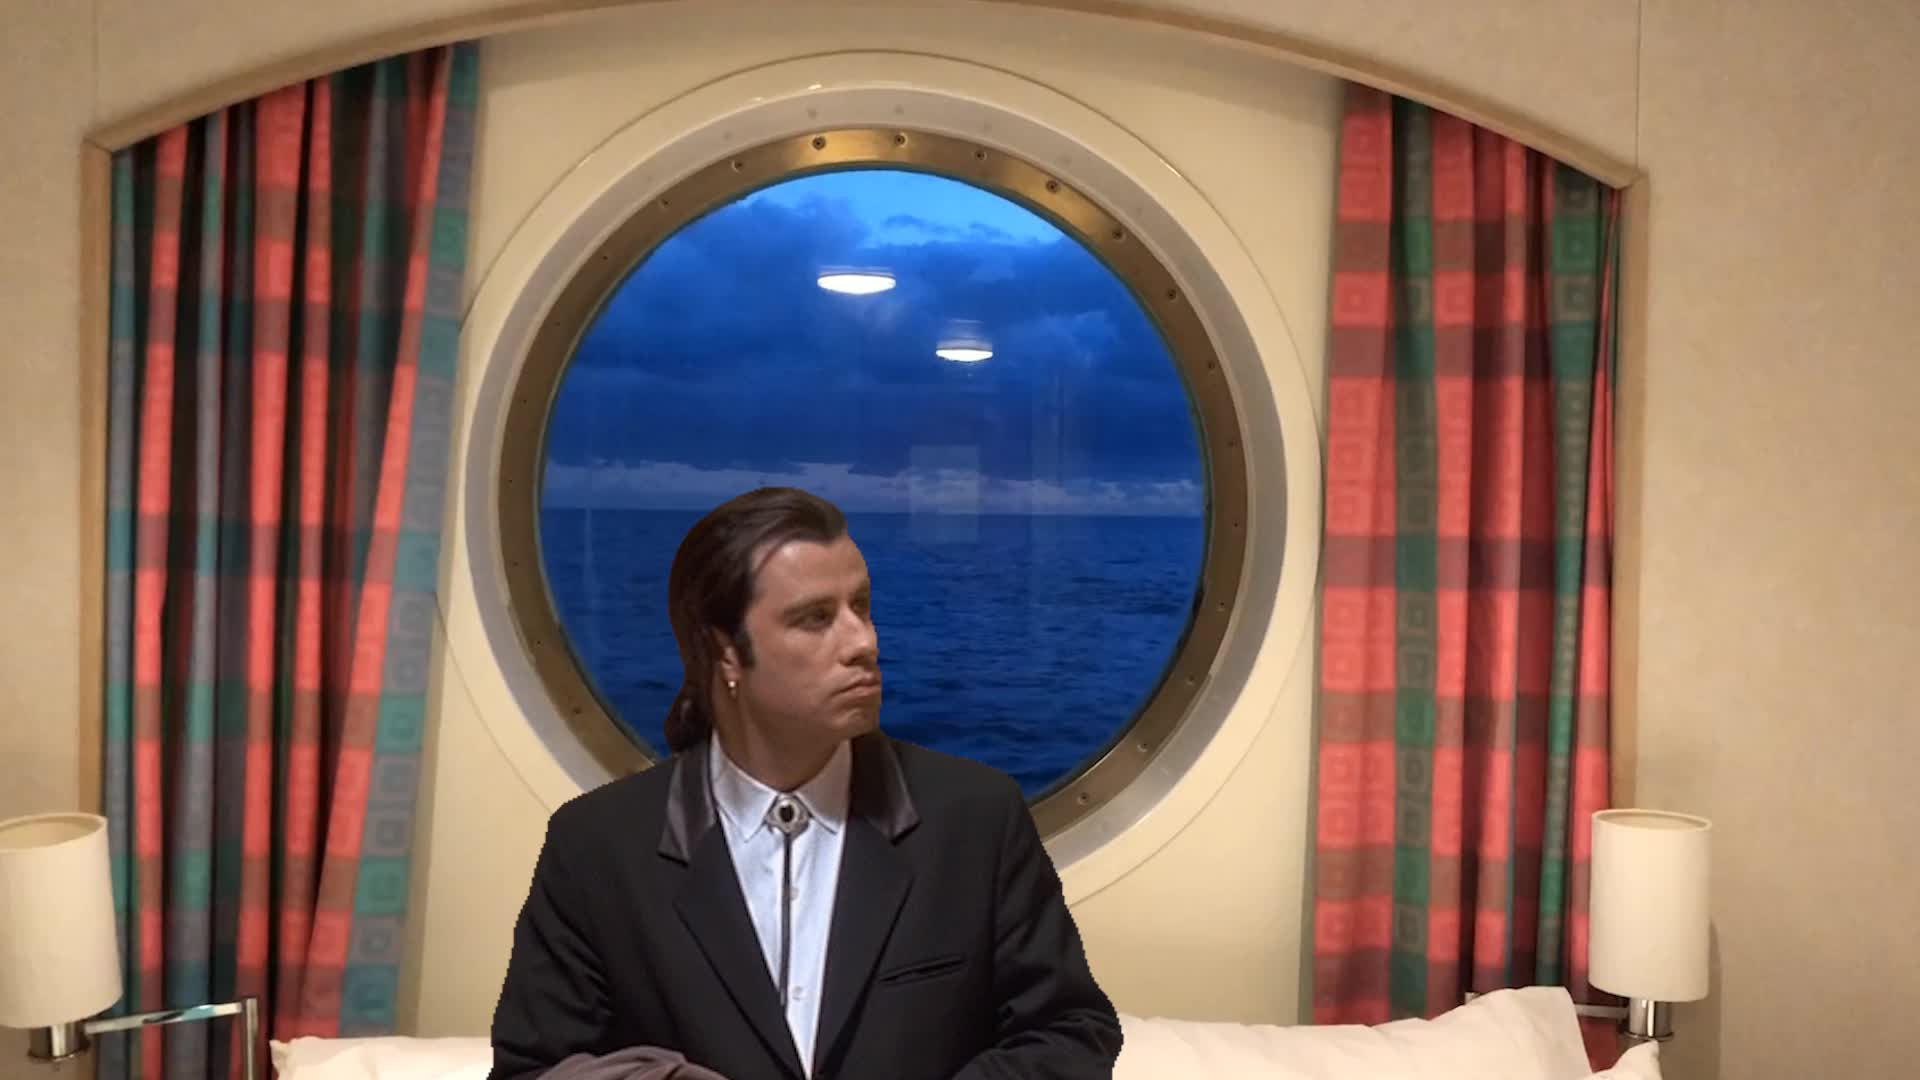 Cinemagraphs, Waves Through The Window Travolta GIFs